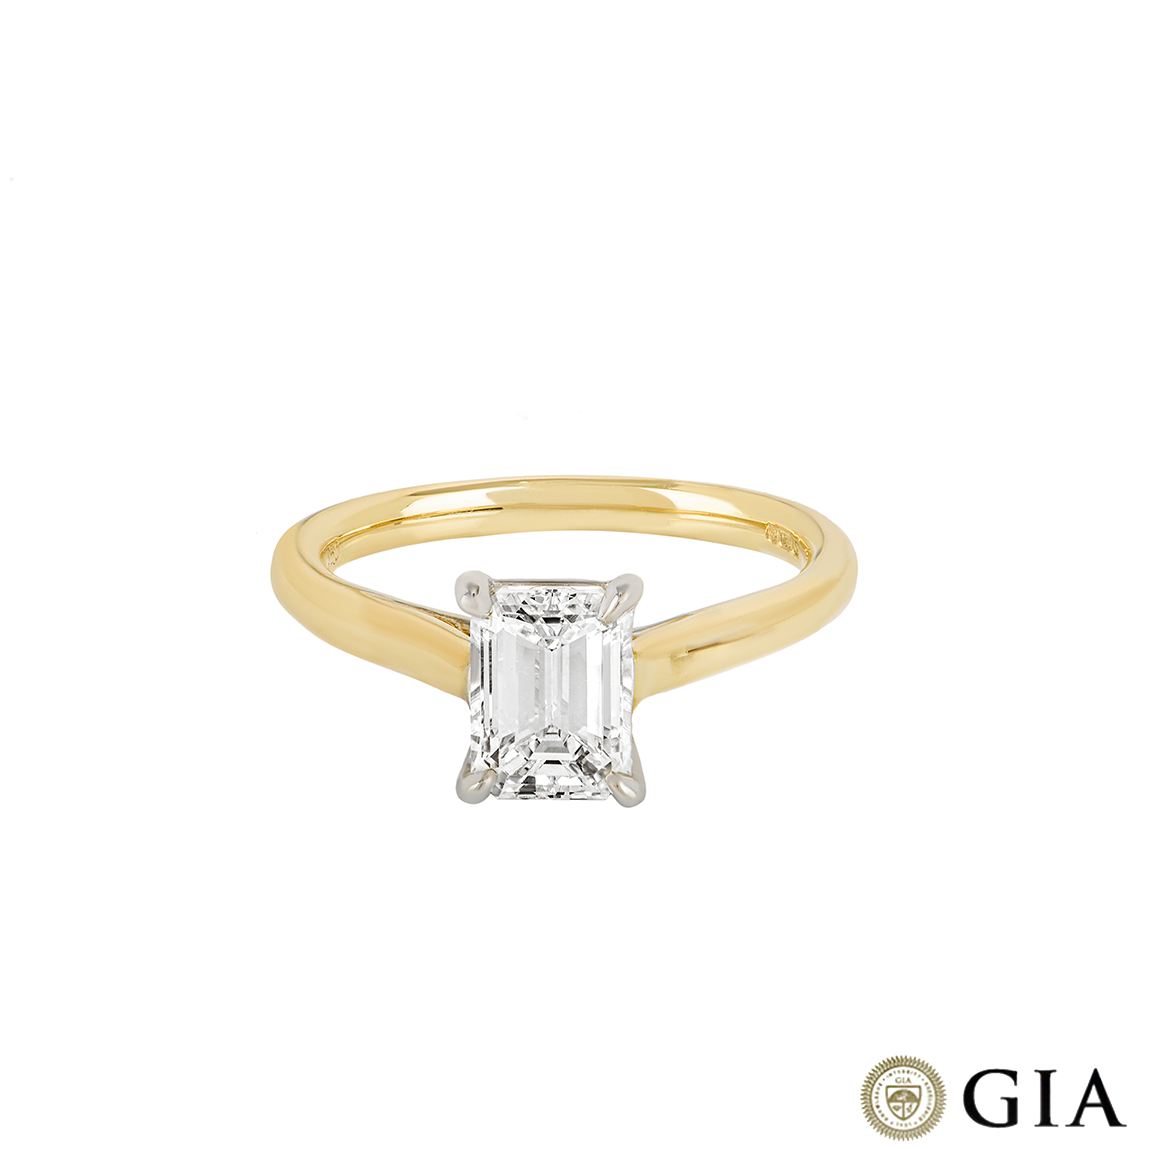 Yellow Gold Emerald Cut Diamond Ring 1.31ct F/VVS2